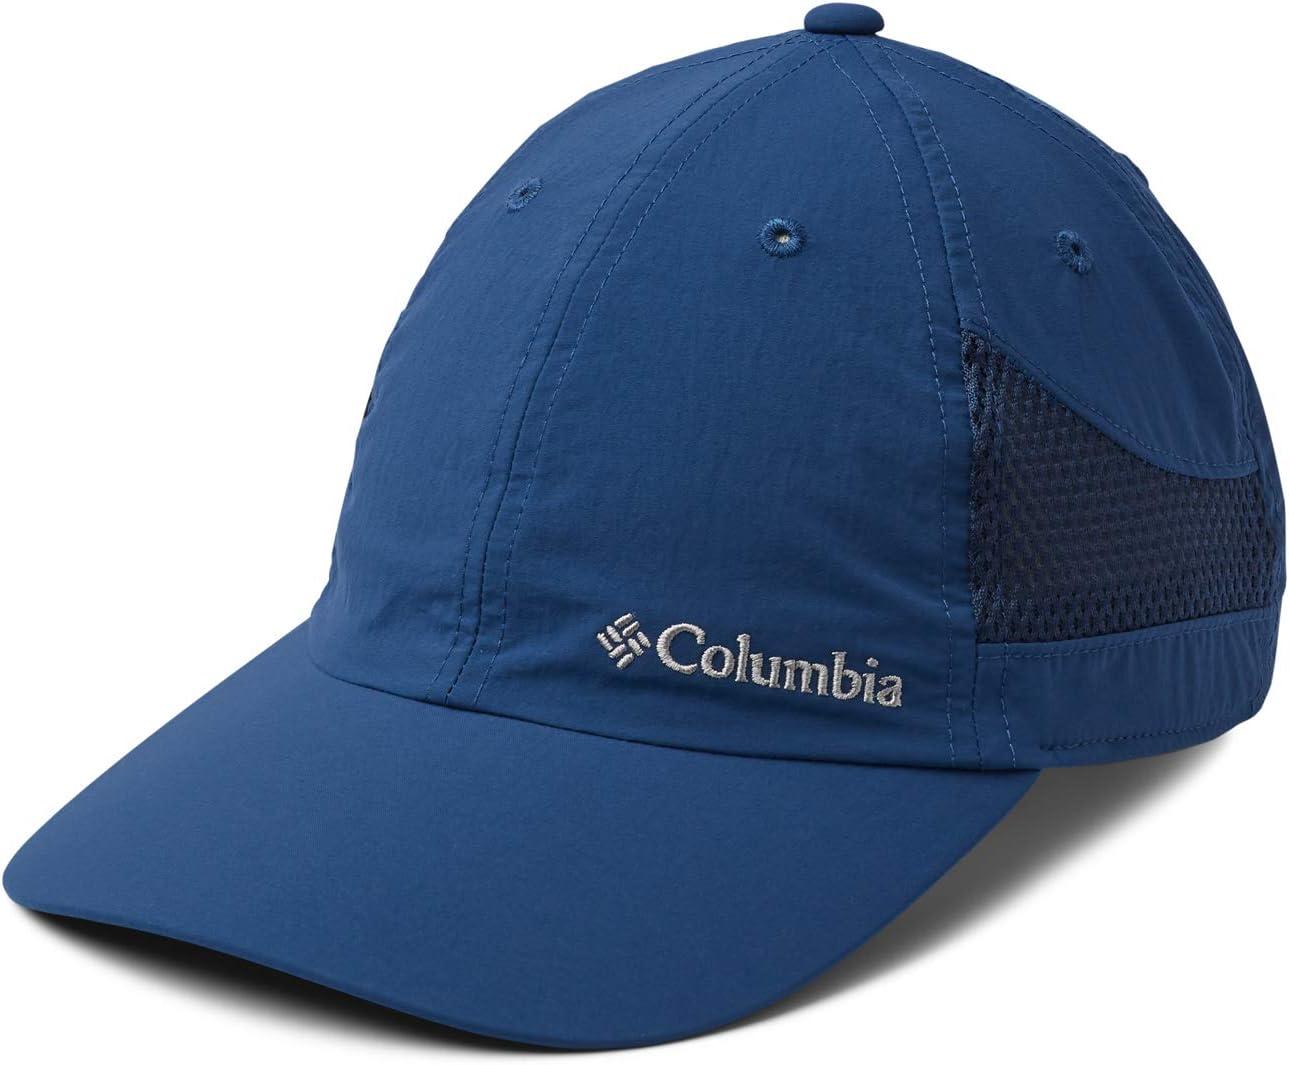 Gorra Unisex Unisex Adulto Columbia Tech Shade Hat